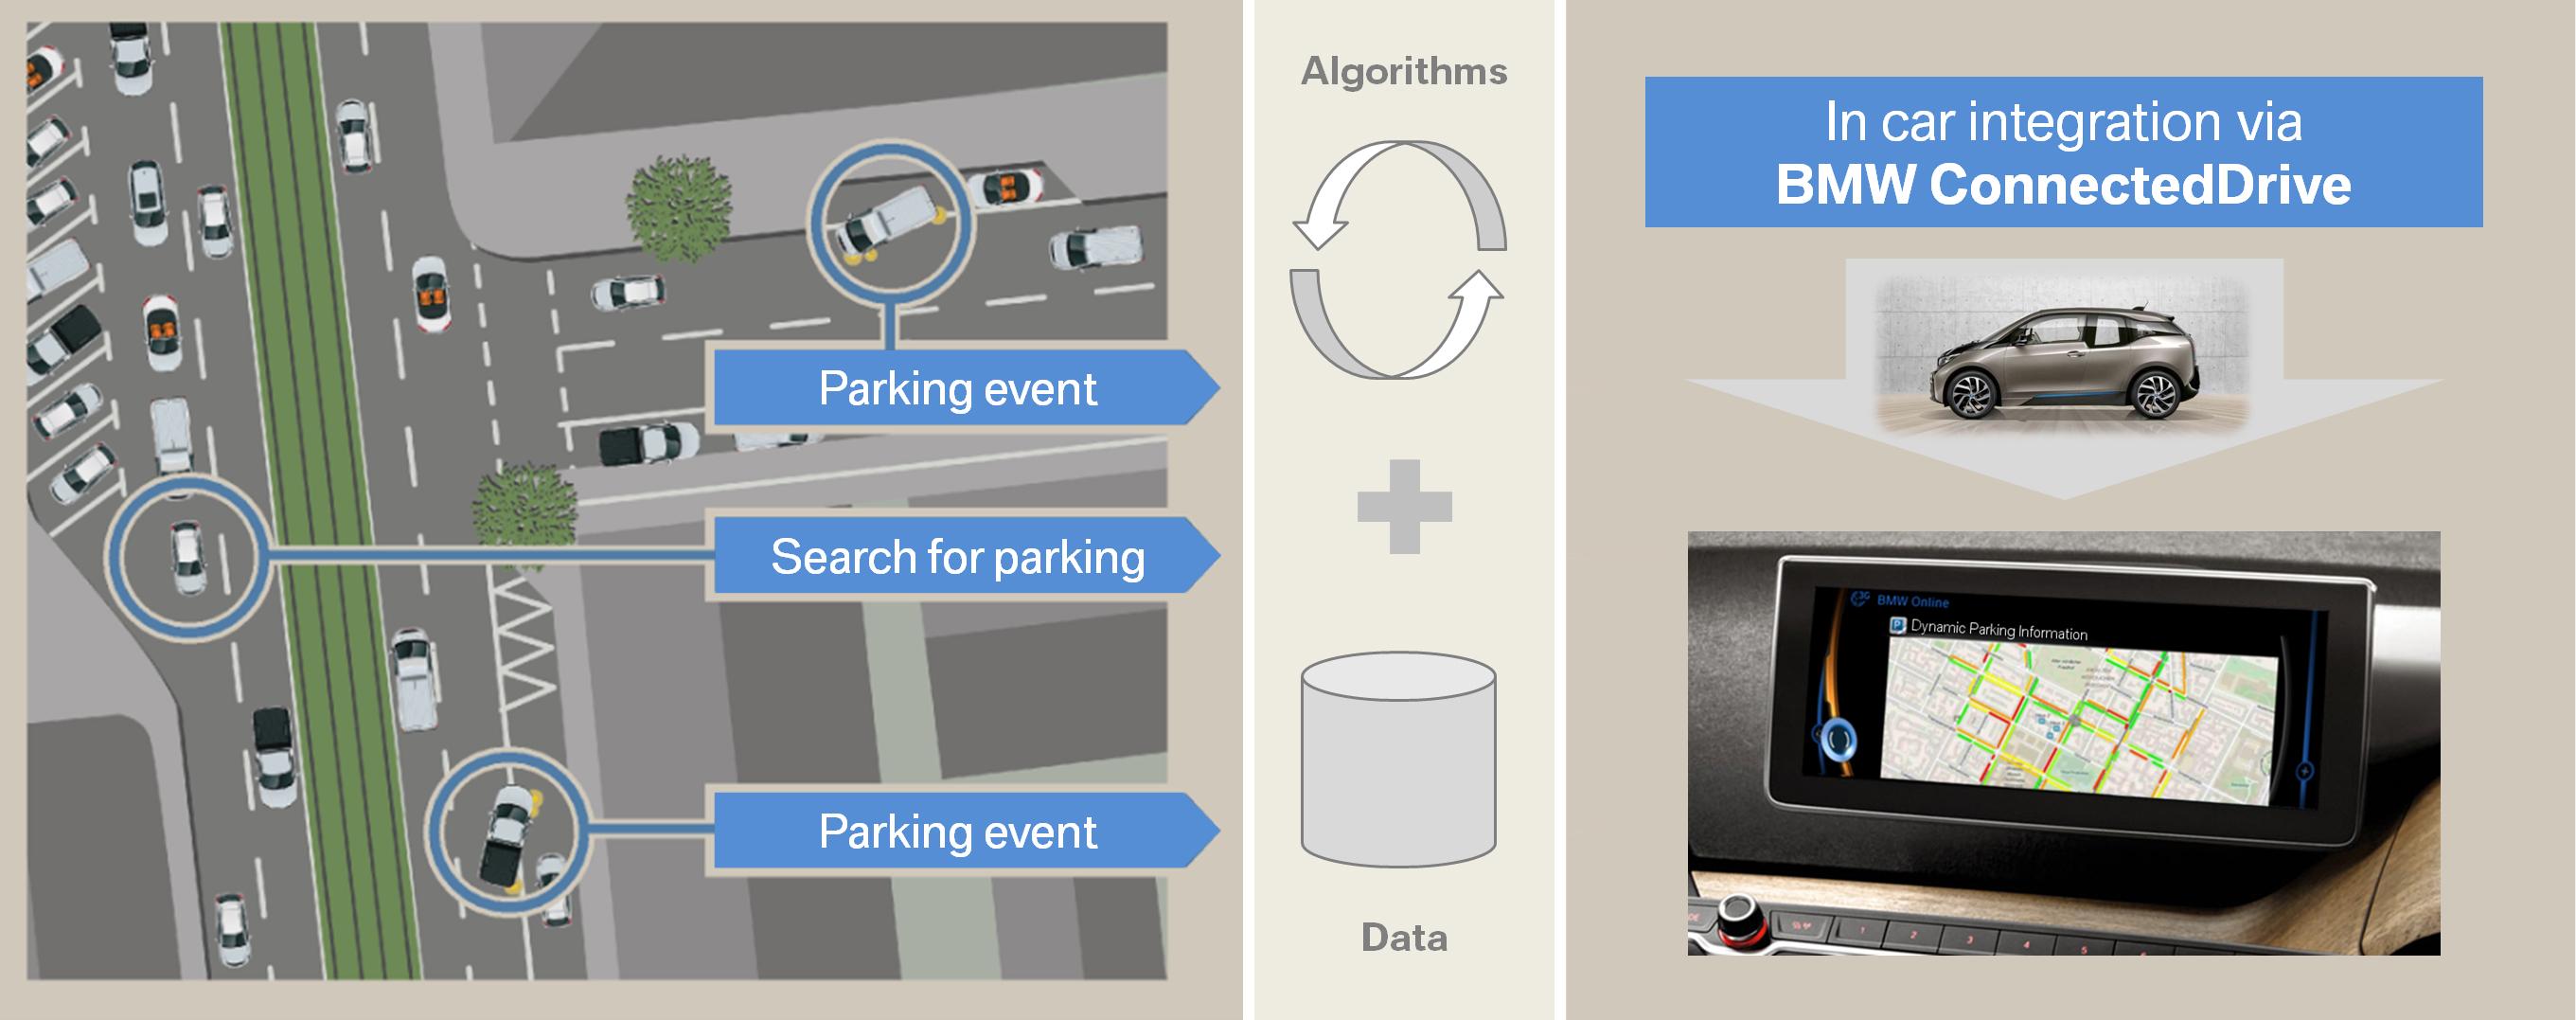 BMW ConnectedDrive, Dynamic Parking Prediction